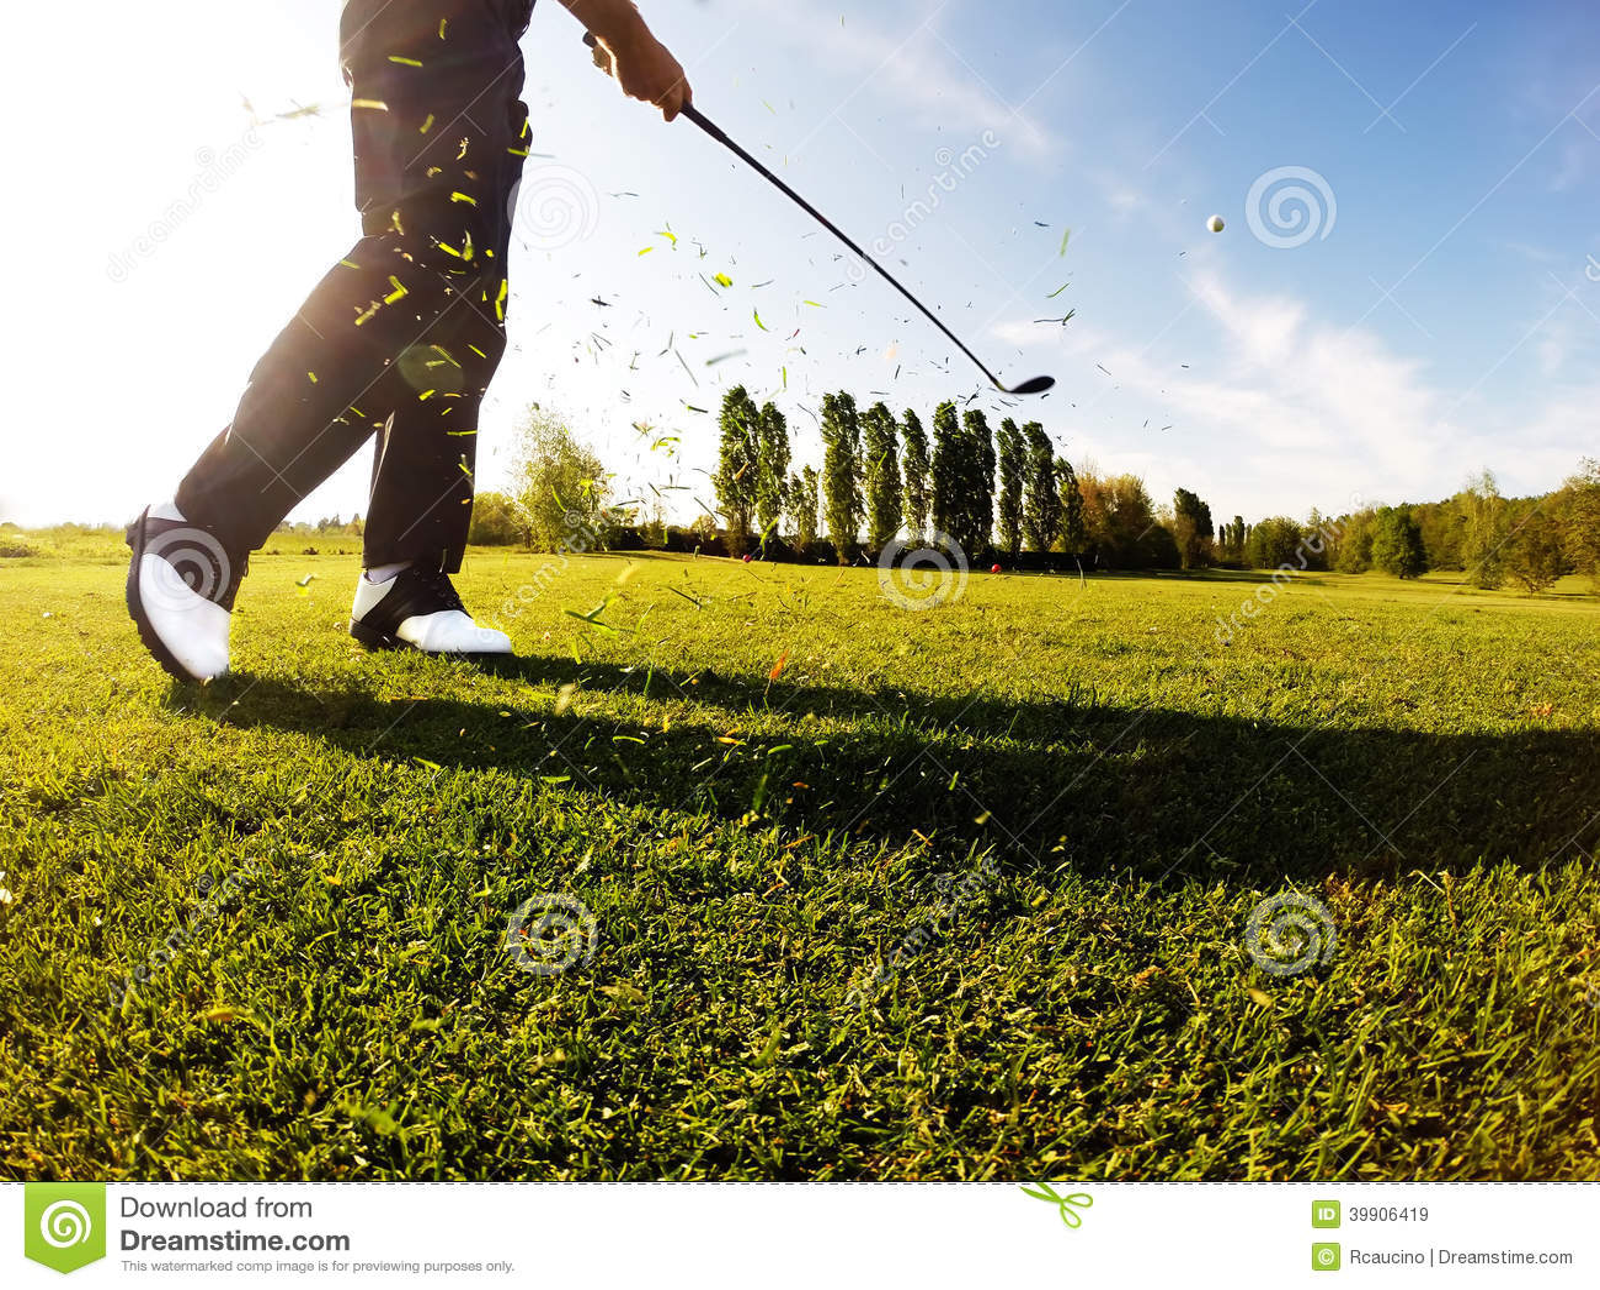 Le golfeur exécute un tir de golf du fairway.